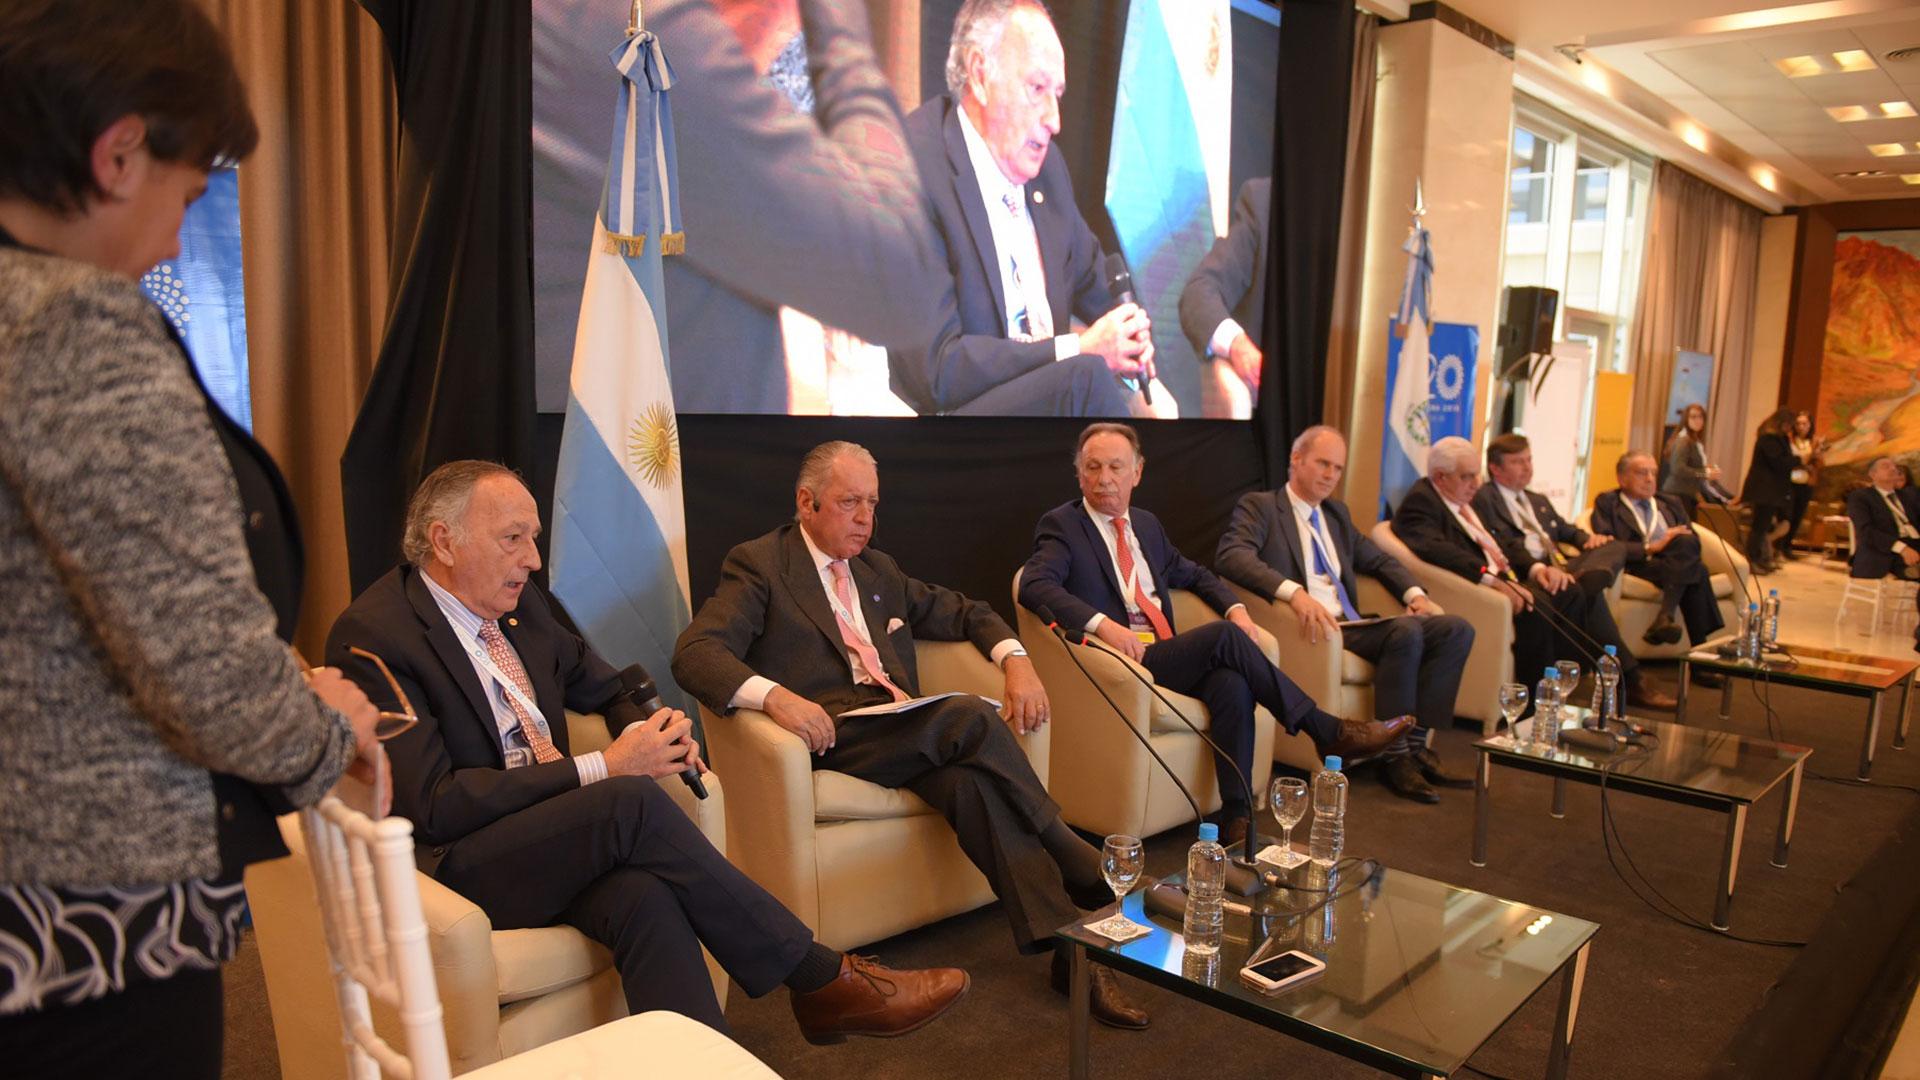 Los empresarios Miguel Acevedo, Daniel Funes de Rioja, Gustavo Weiss, Javier Bolzico, Adelmo Gabbi, Daniel Pelegrina y Eduardo Eurnekian